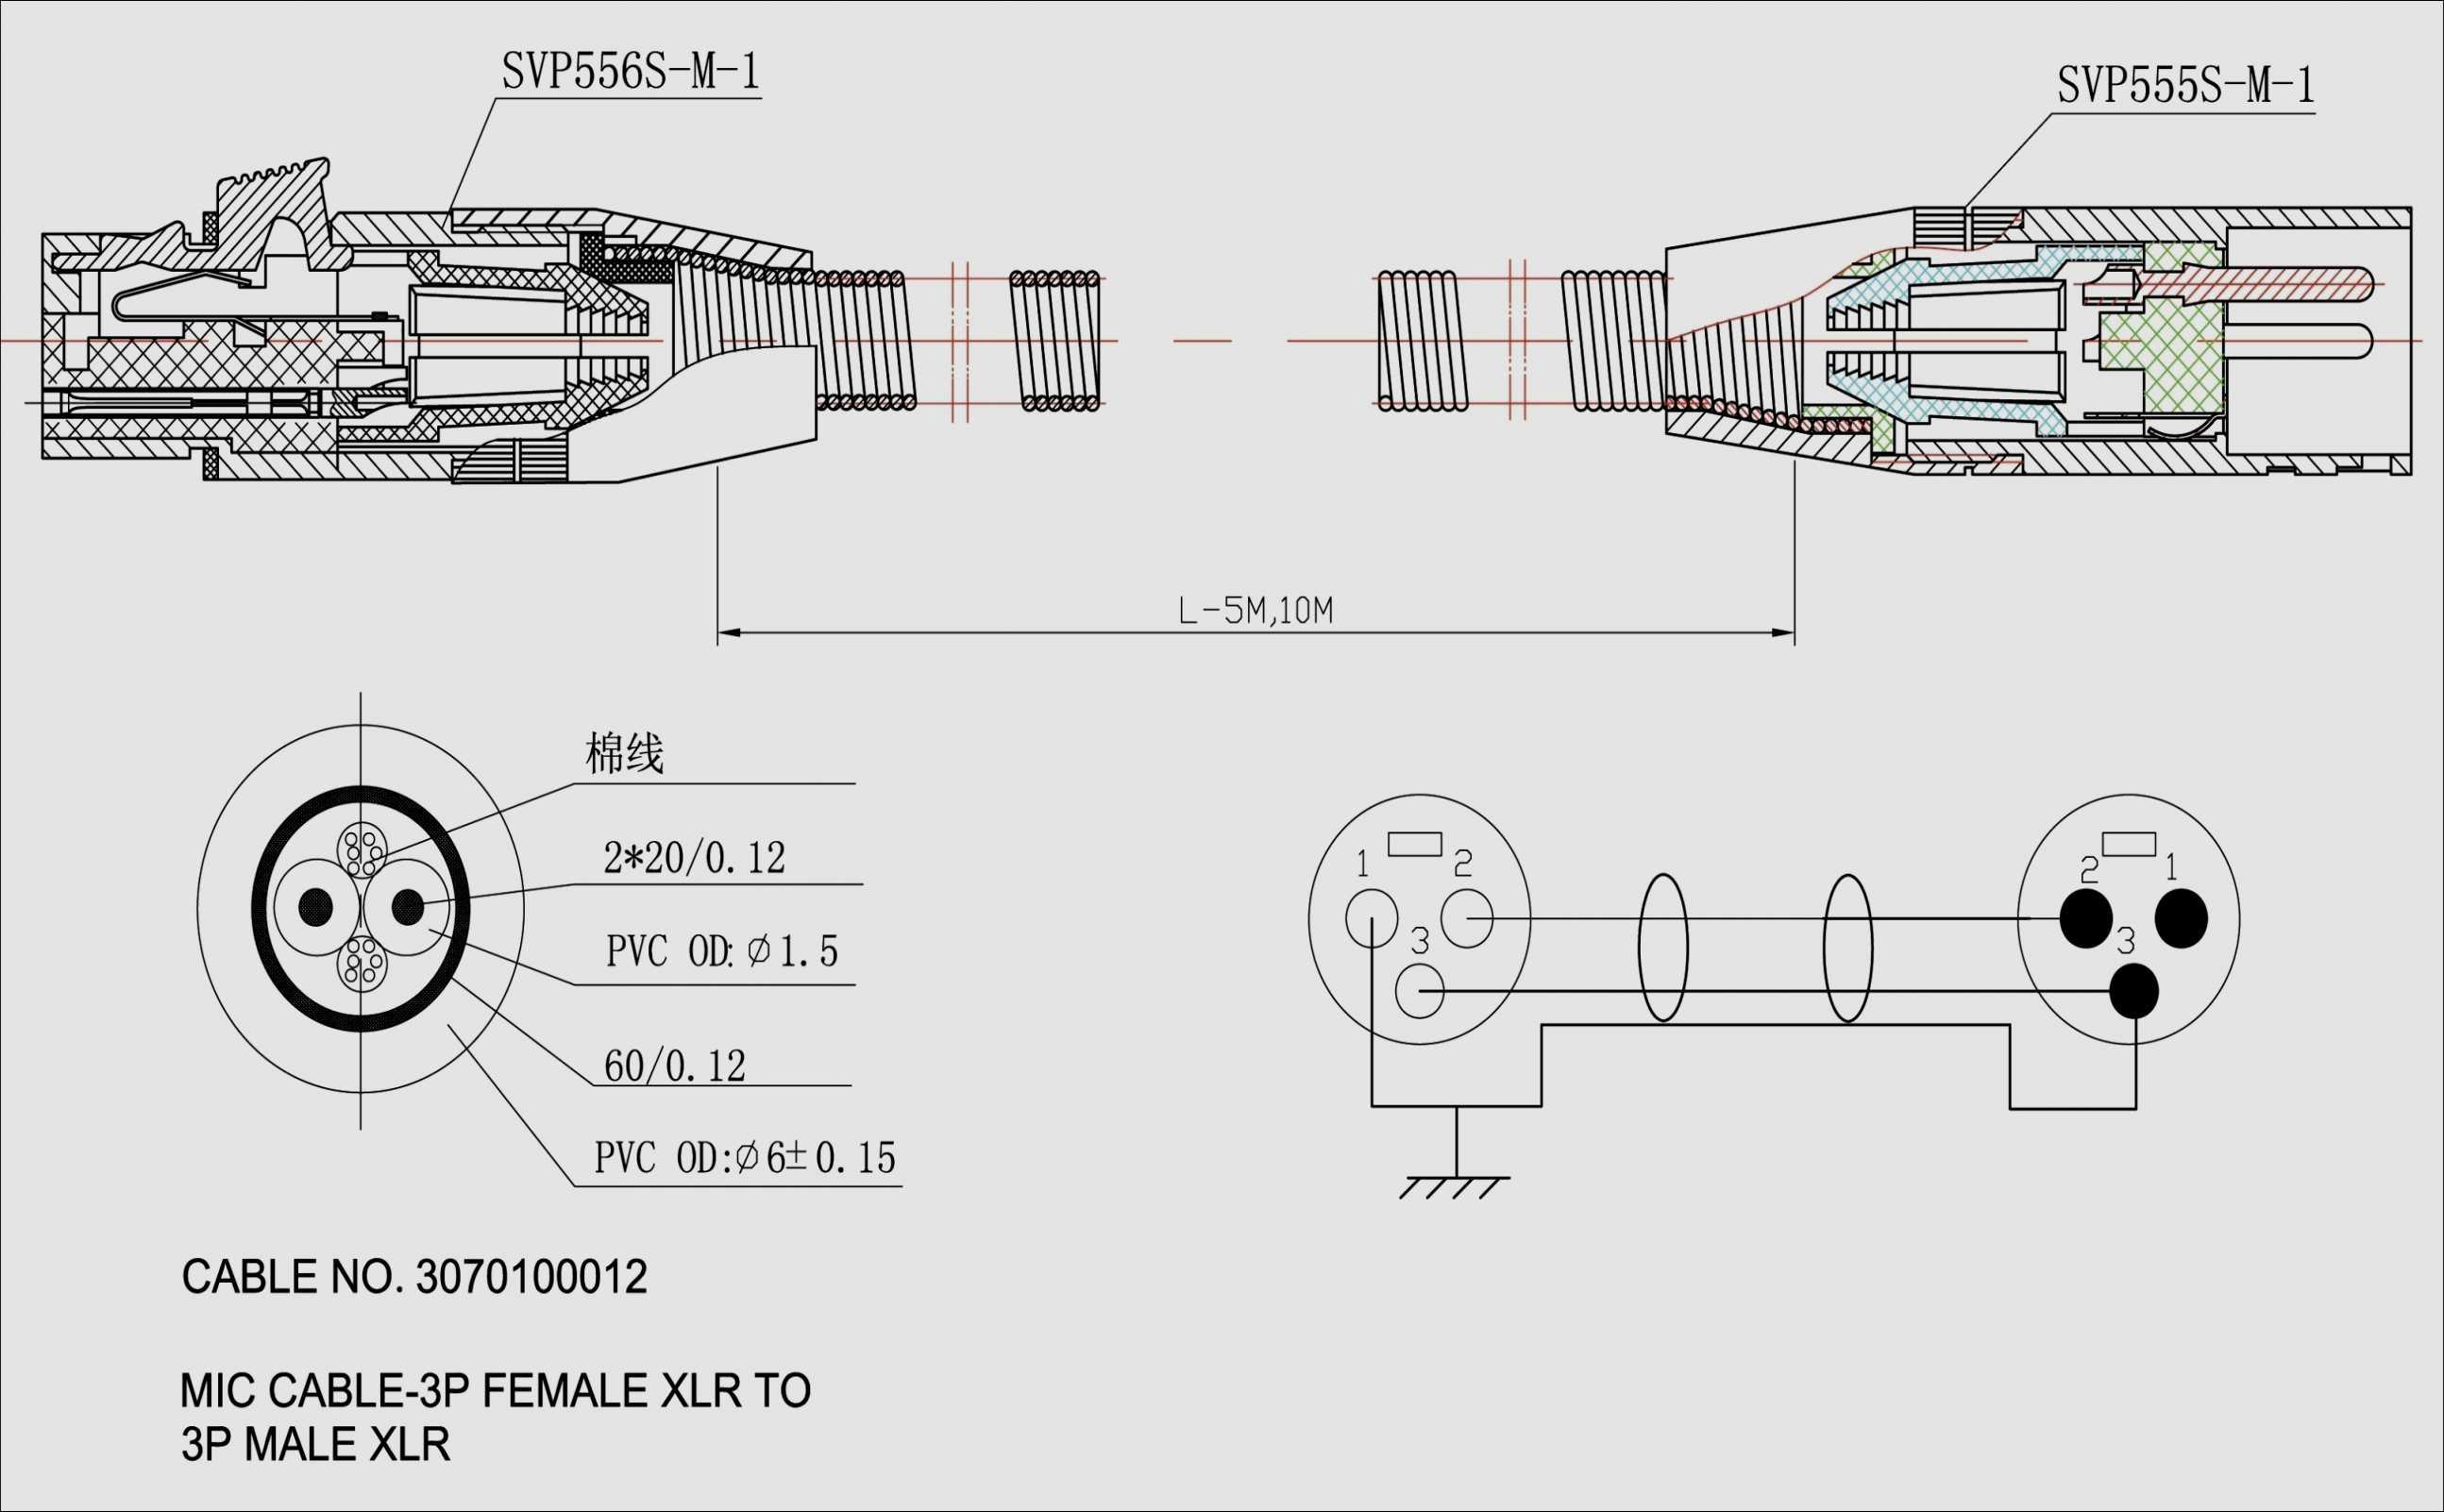 1995 dodge ram 1500 wiring diagram lx 6714  2001 dodge ram radio wiring diagram view diagram 2001  2001 dodge ram radio wiring diagram